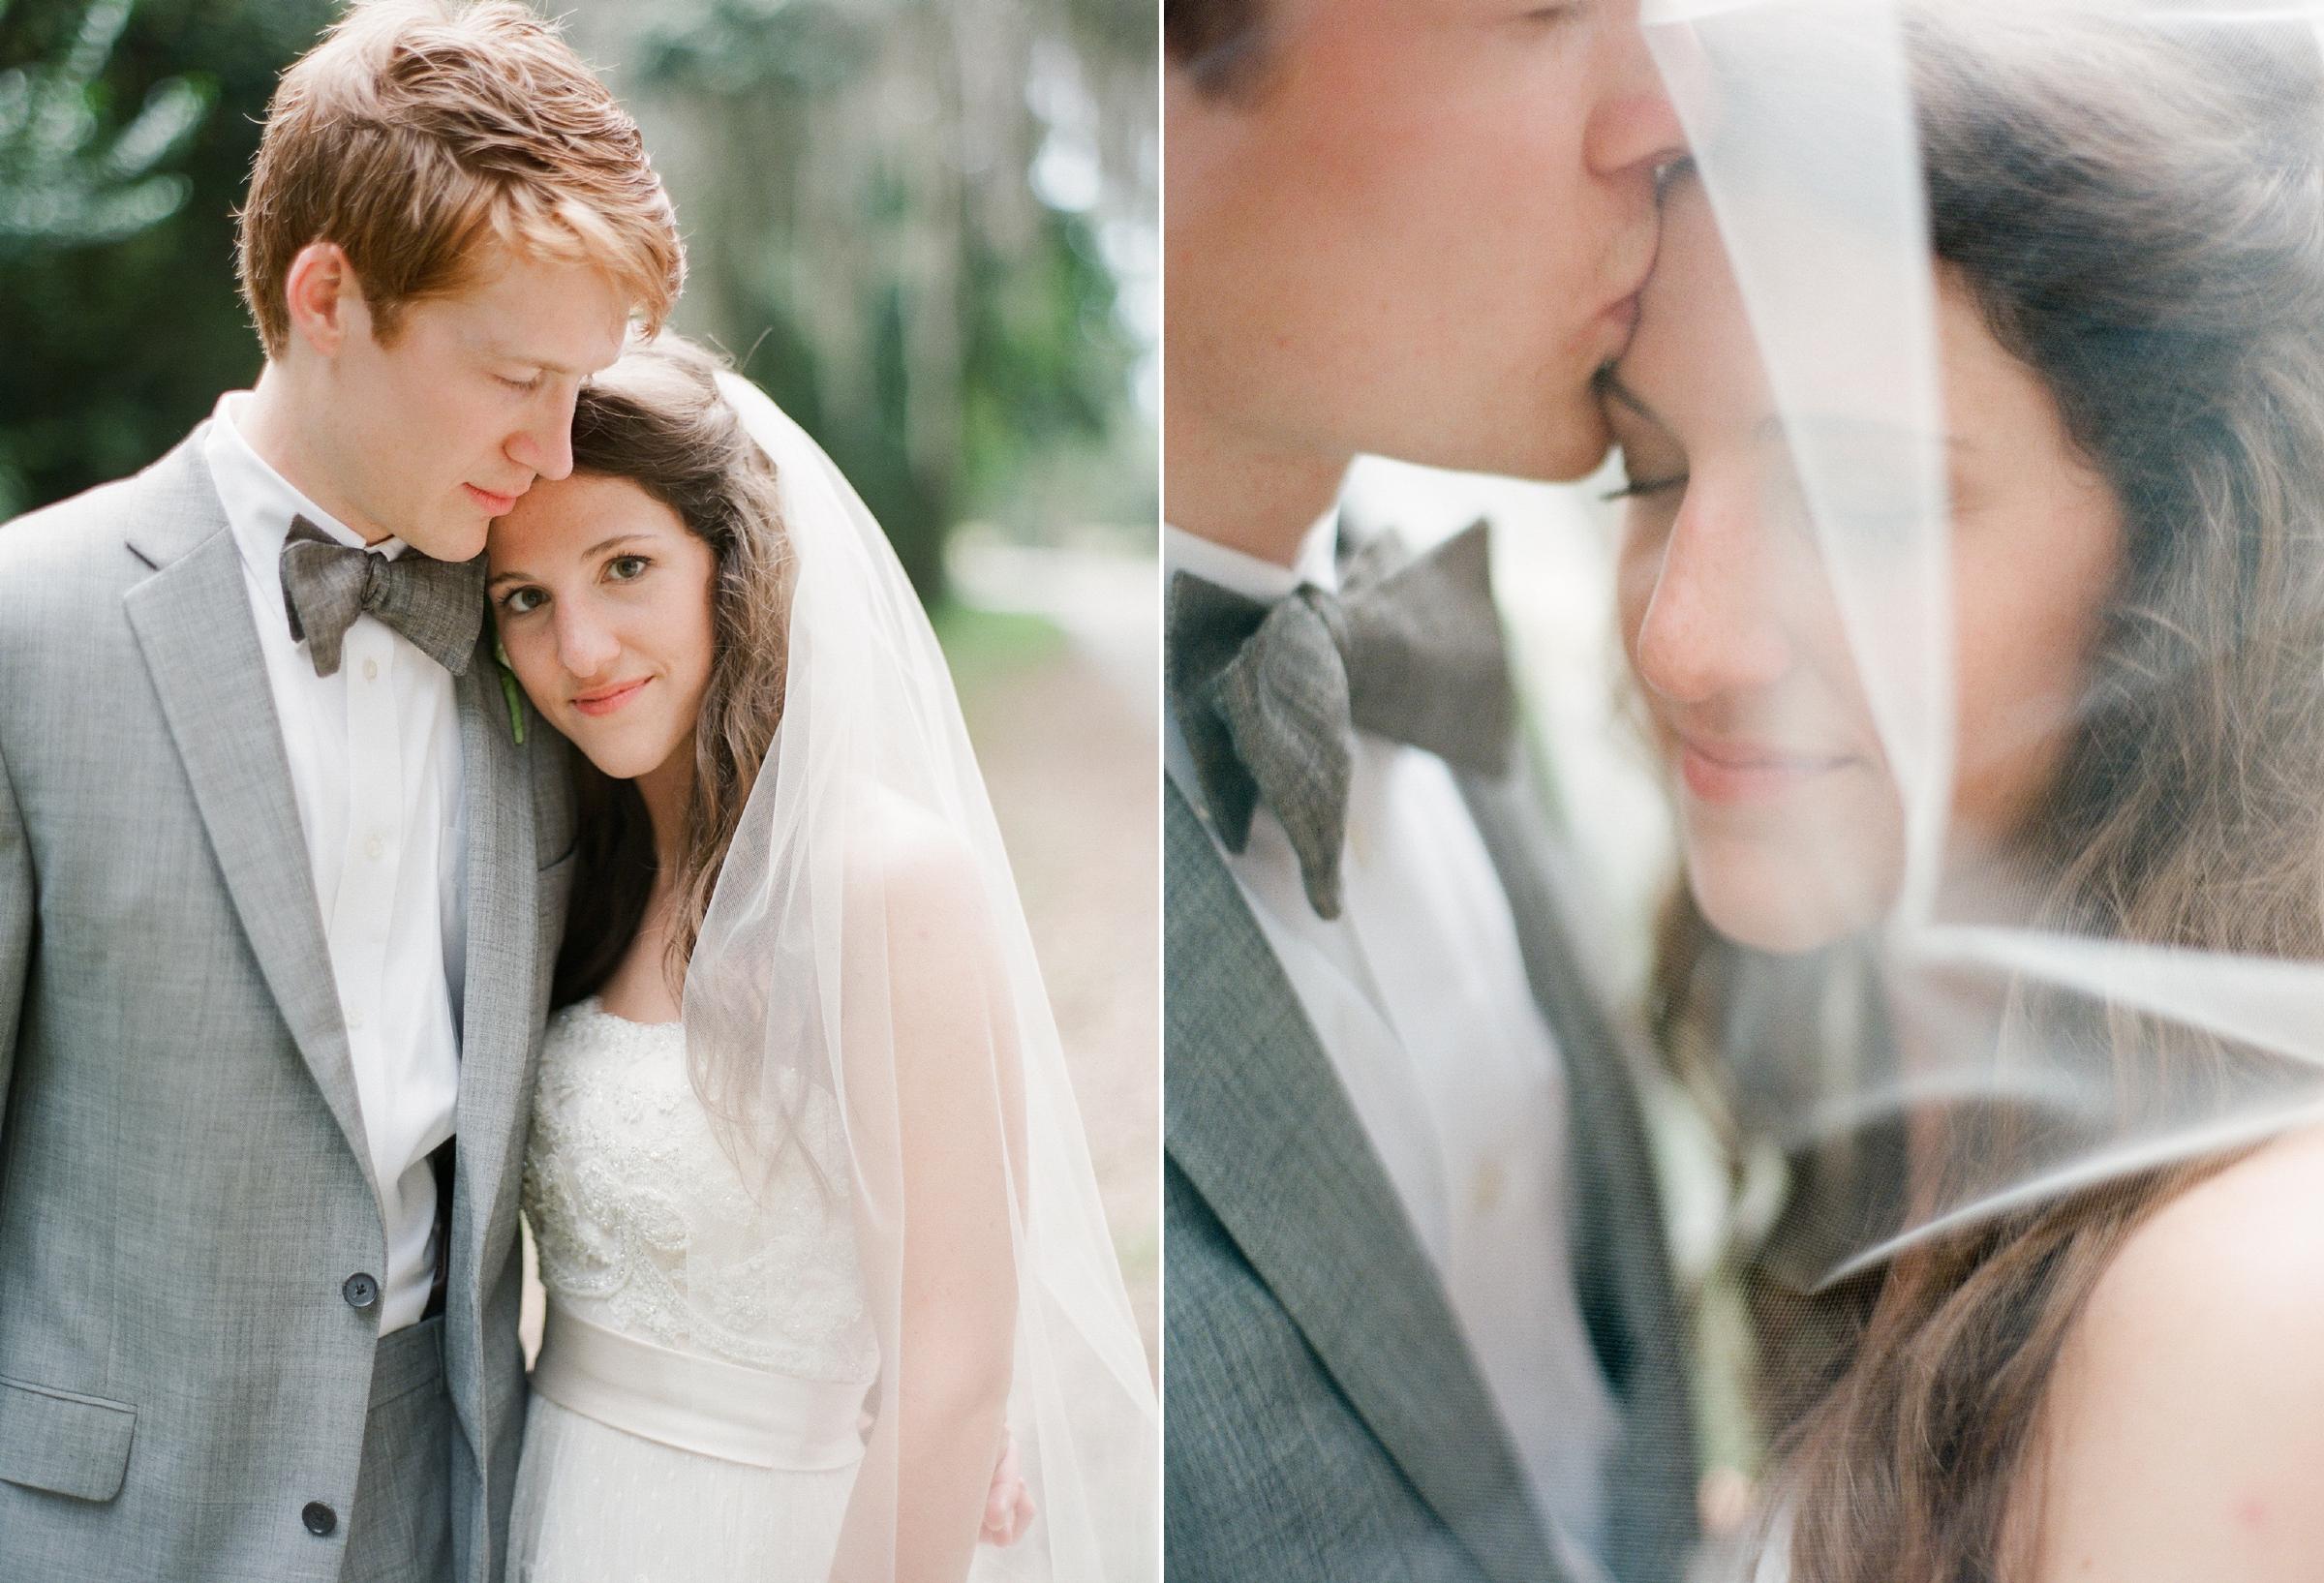 st_simons_island_wedding_photographer_shannon_griffin_0026.jpg